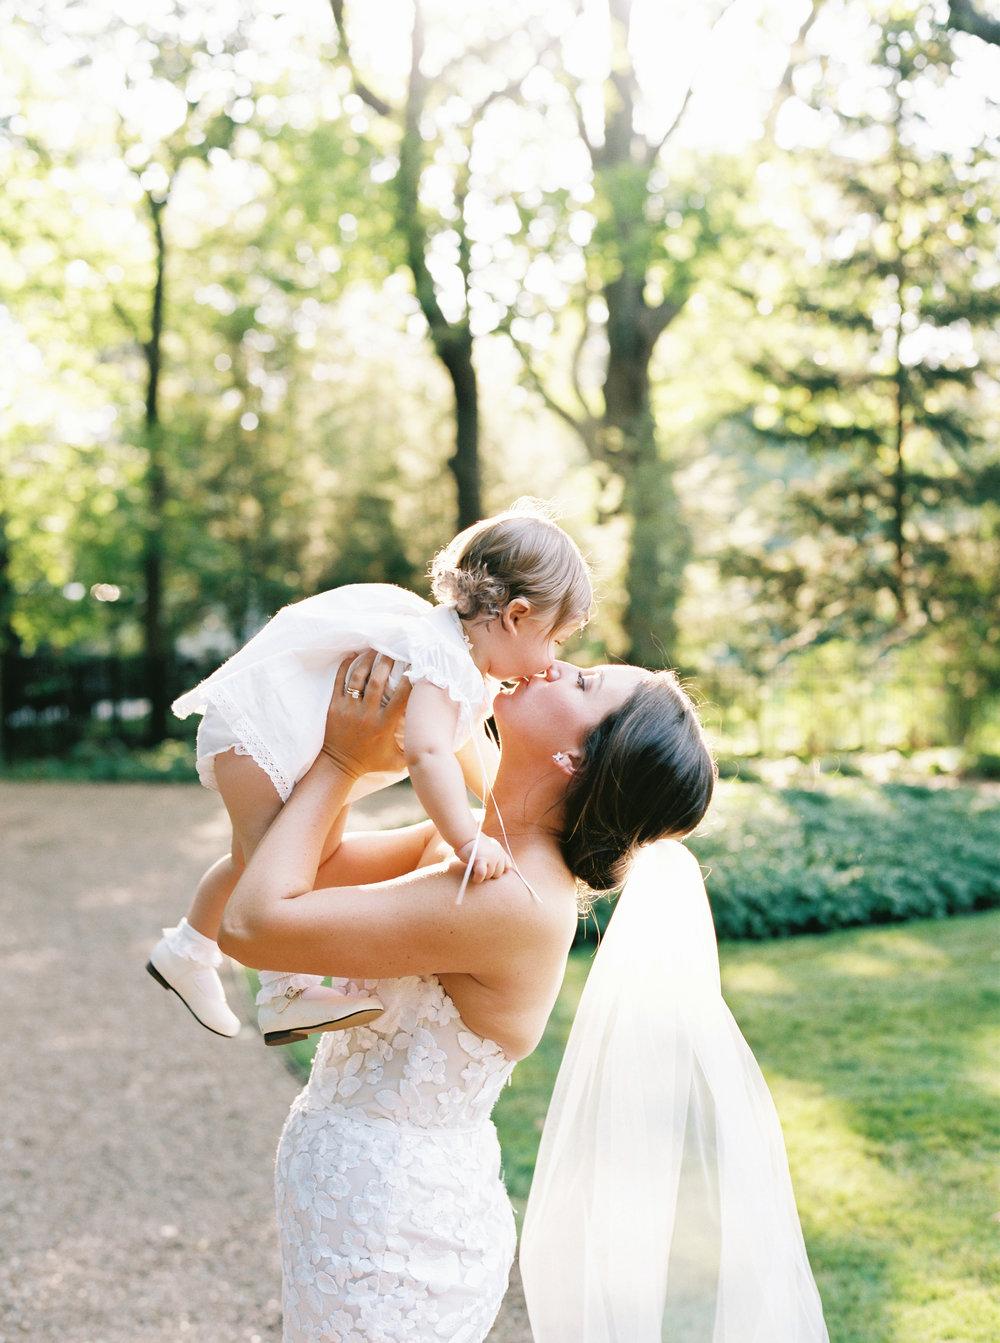 Kyle John l Fine Art Wedding Photography l Chicago, Copenhagen, California, New York, Destination l Blog l Kate and Michael_Winnetka_22